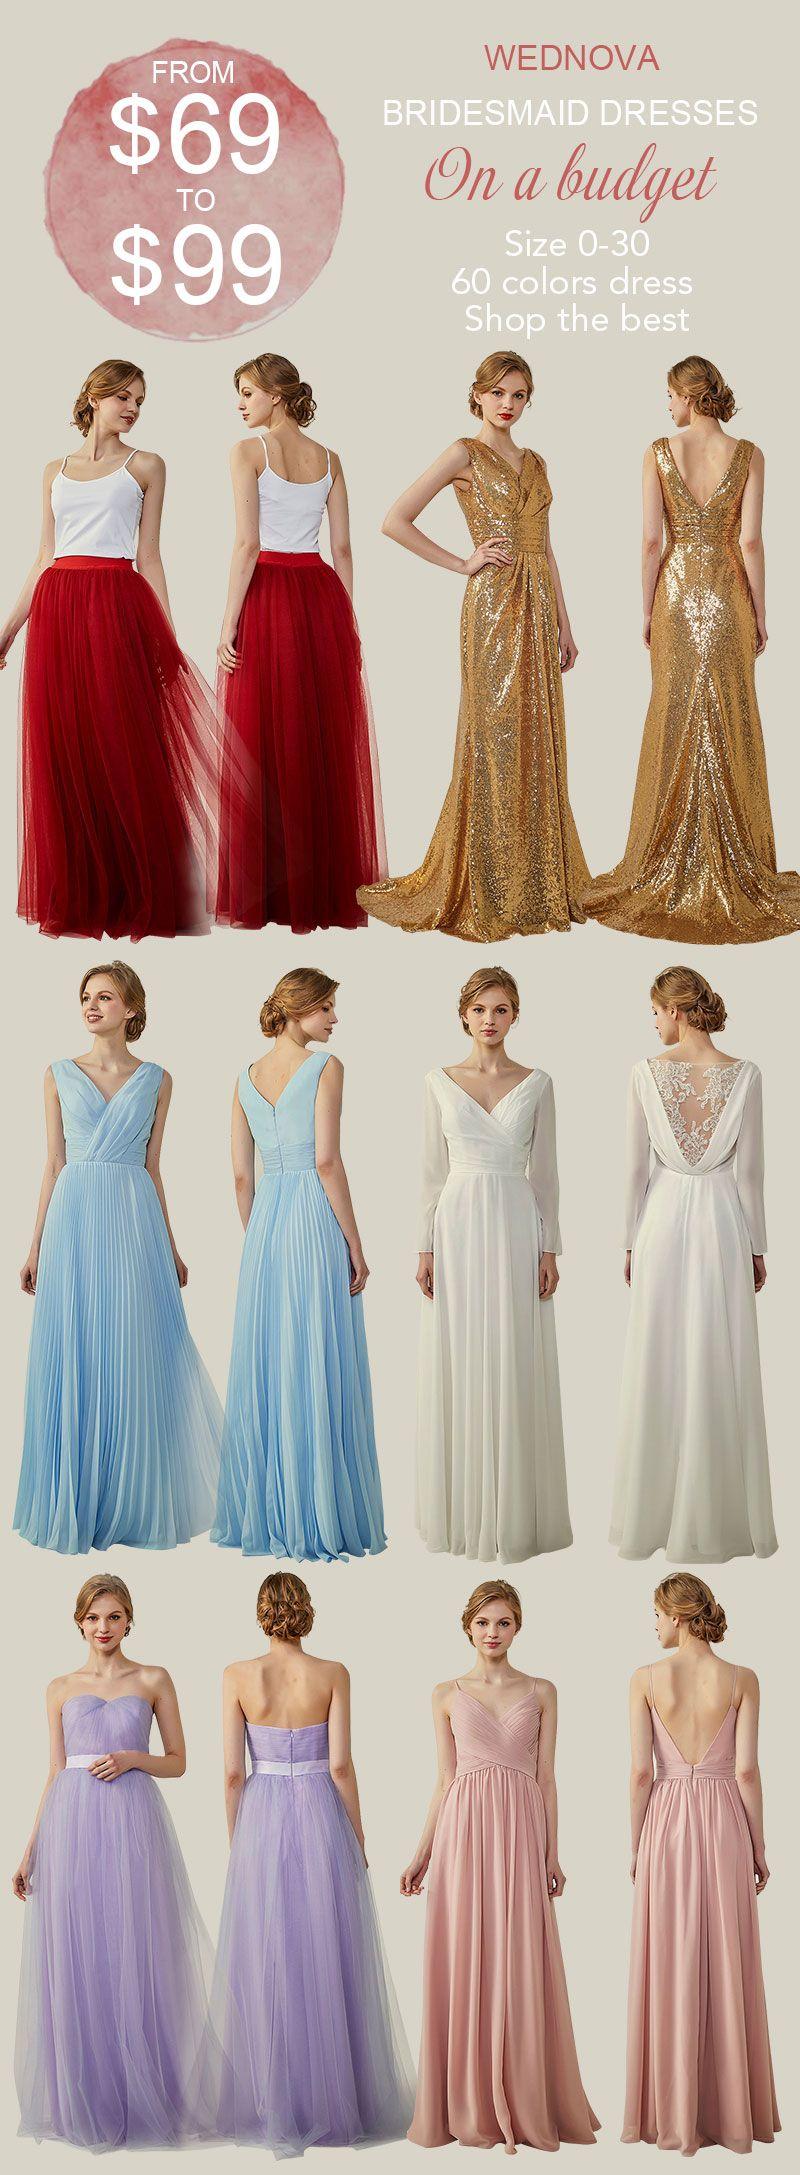 b1c905bc87b Tulle skirts v neck chiffon bridesmaid dresses sequin a line dress 60  colors dress shop the best  bridesmaids sweetheart bridesmaid dresses